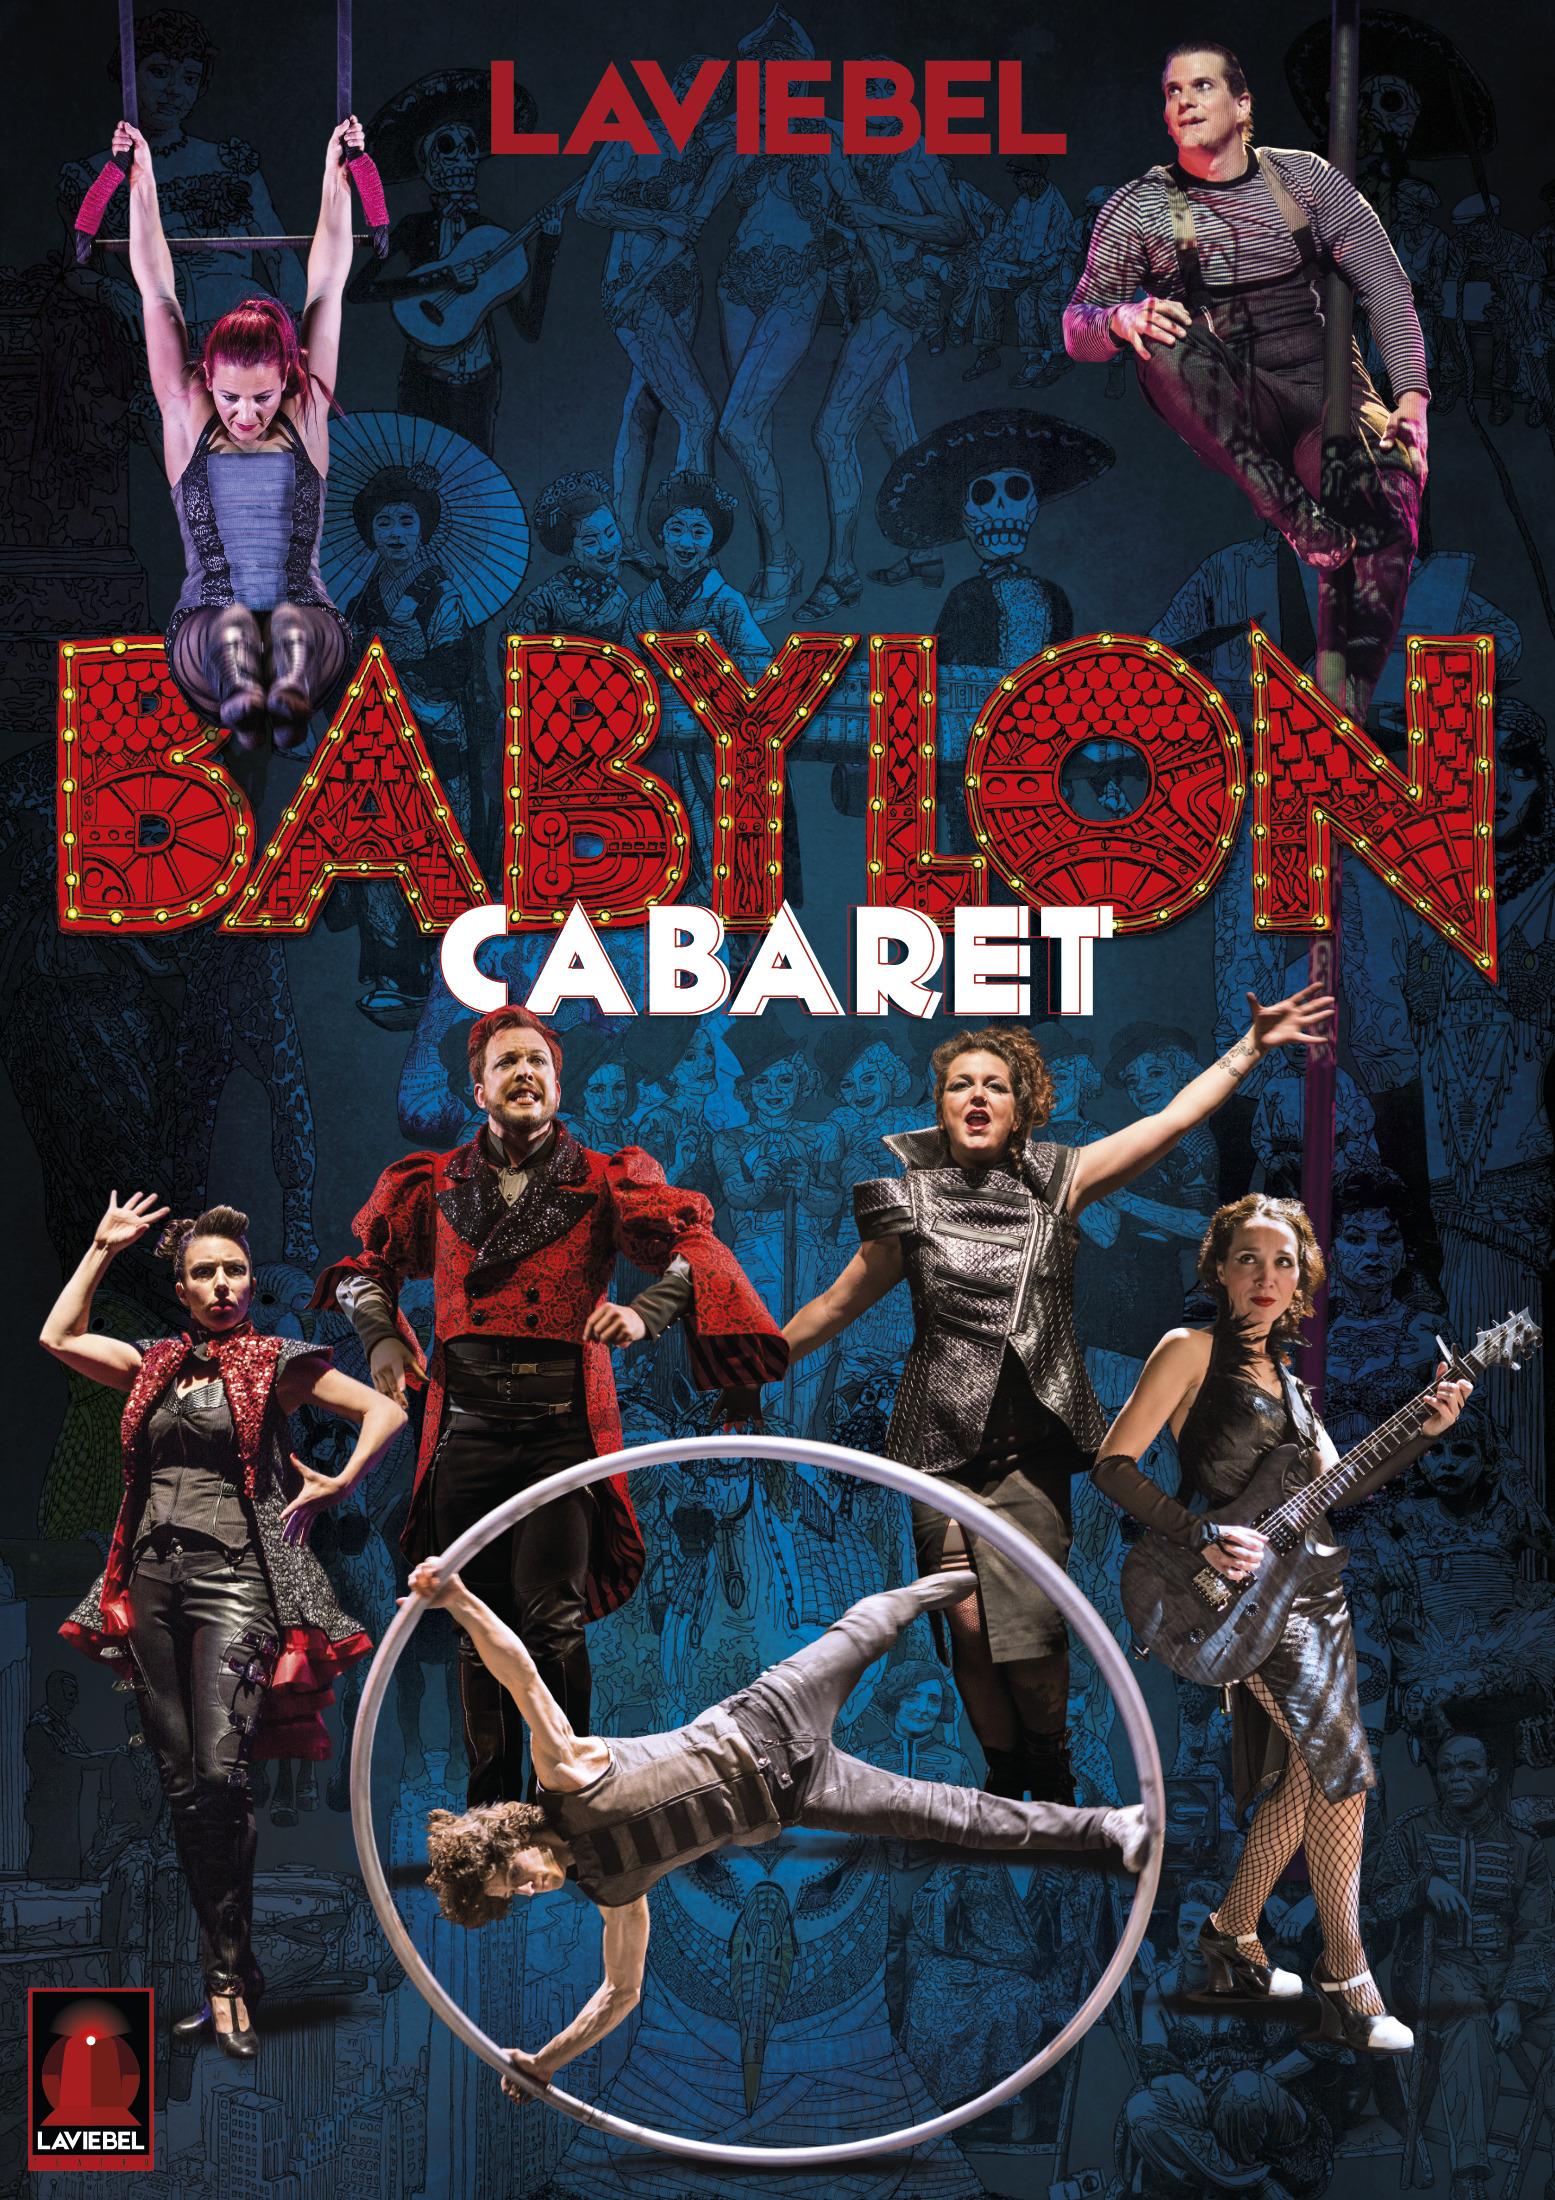 Cartel Cabaret babylon de Laviebel